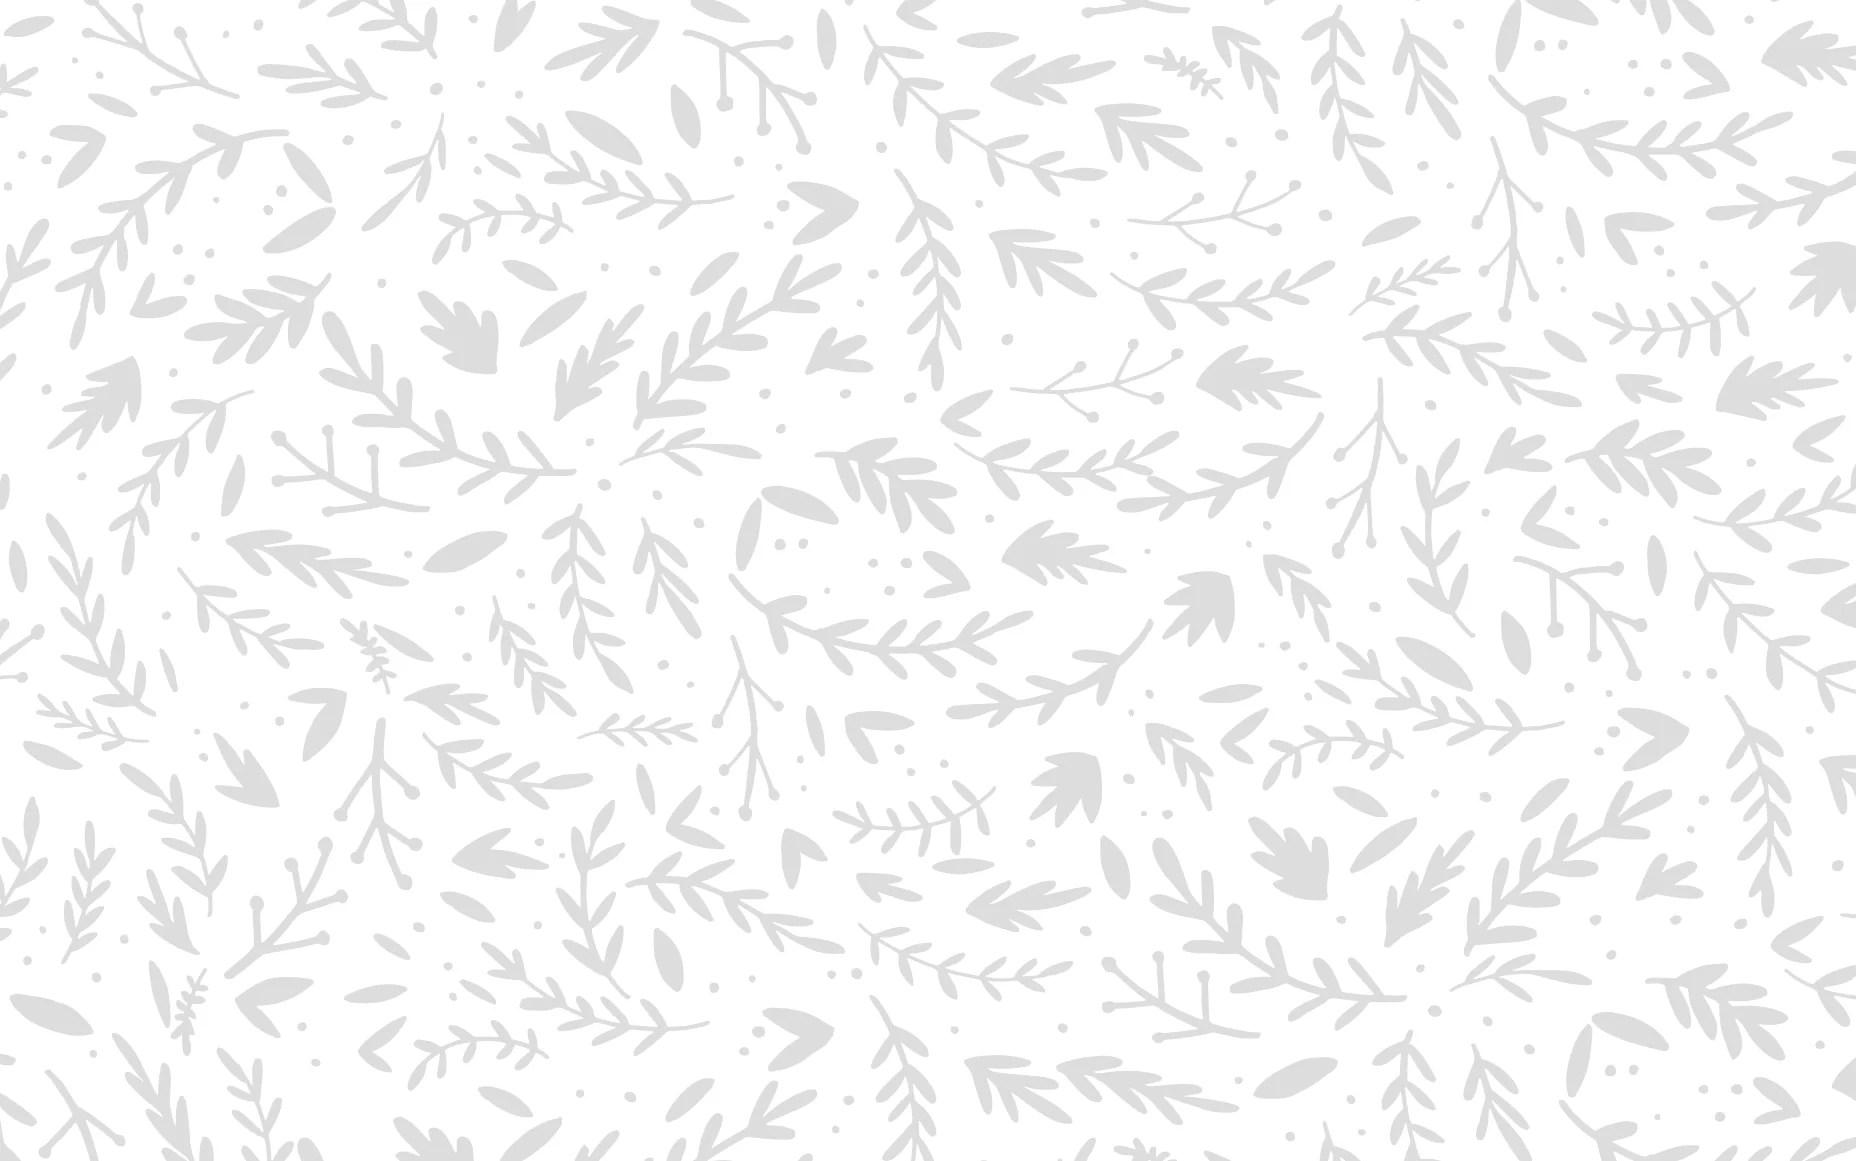 Desktop Wallpaper Pinterest Fall Free Confetti Desktop Download Downloadable Hand